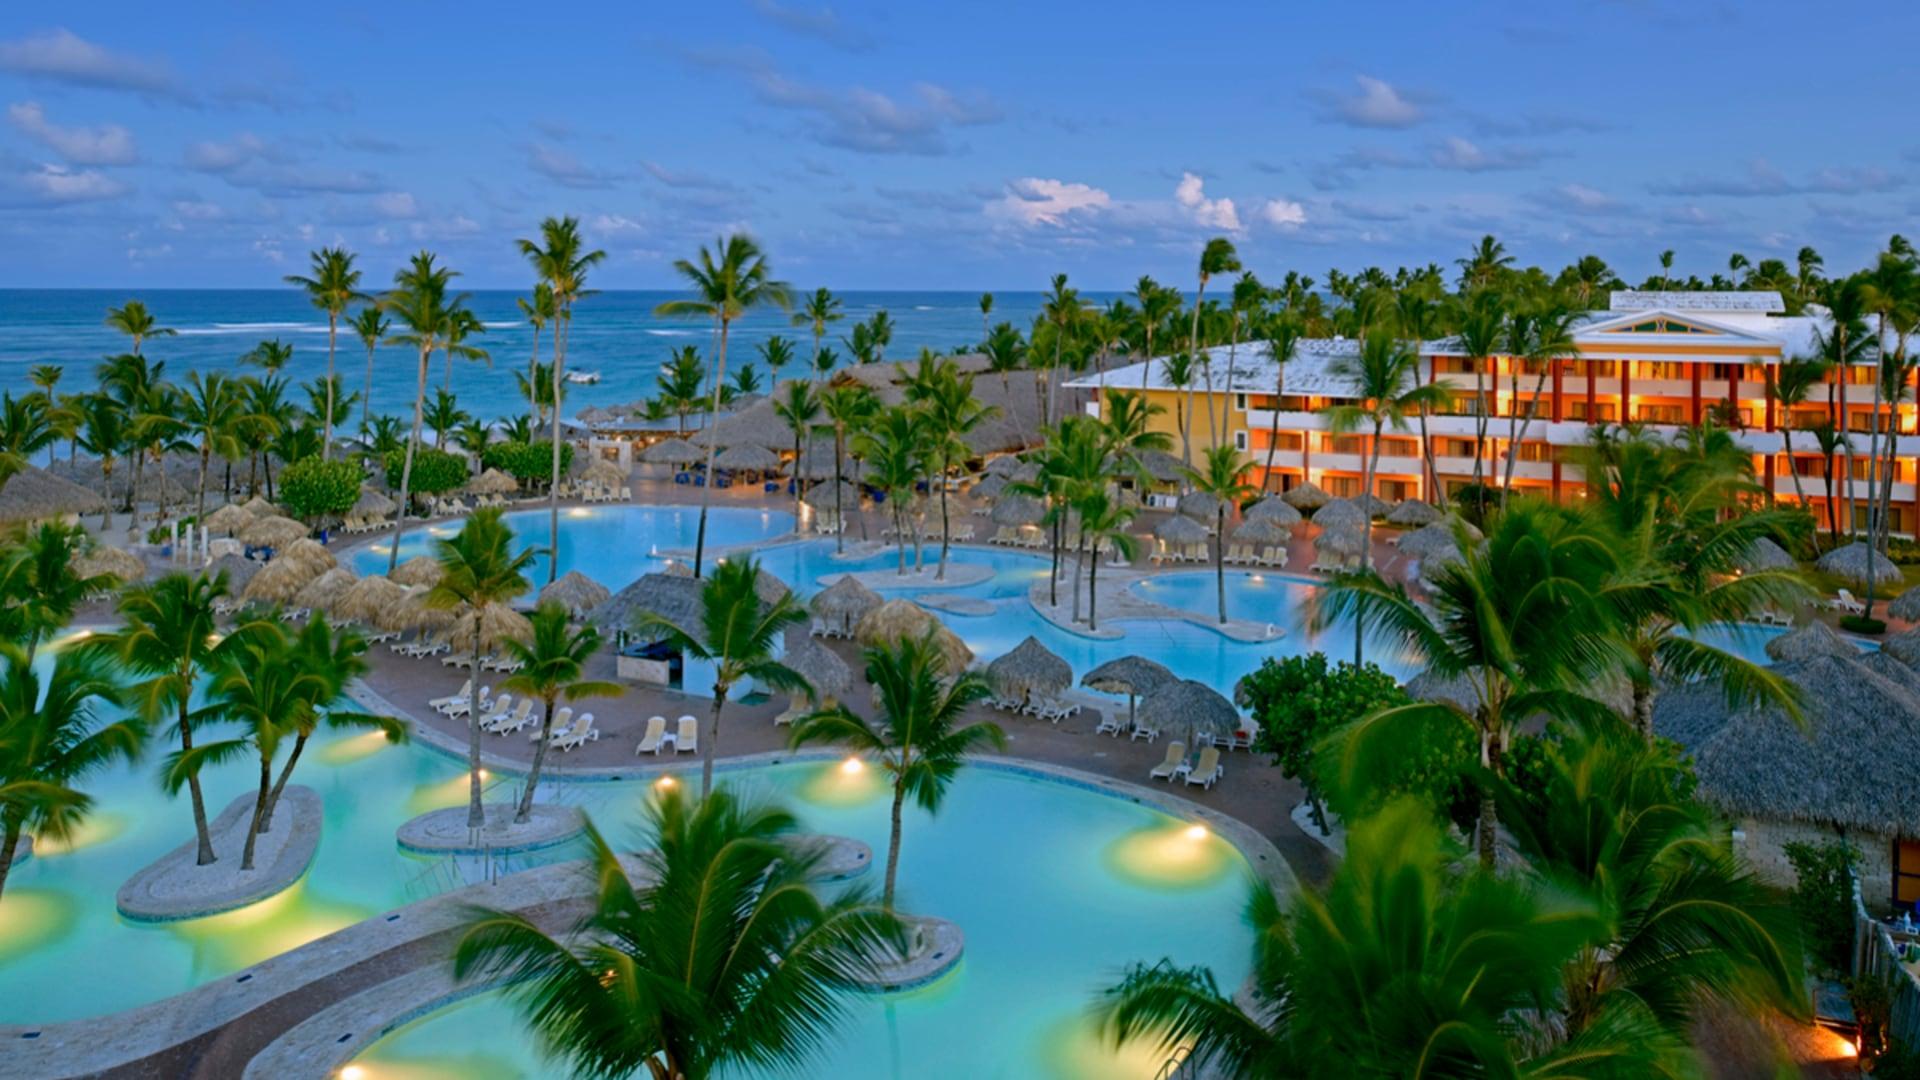 Iberostar Punta Cana Glenny Travel